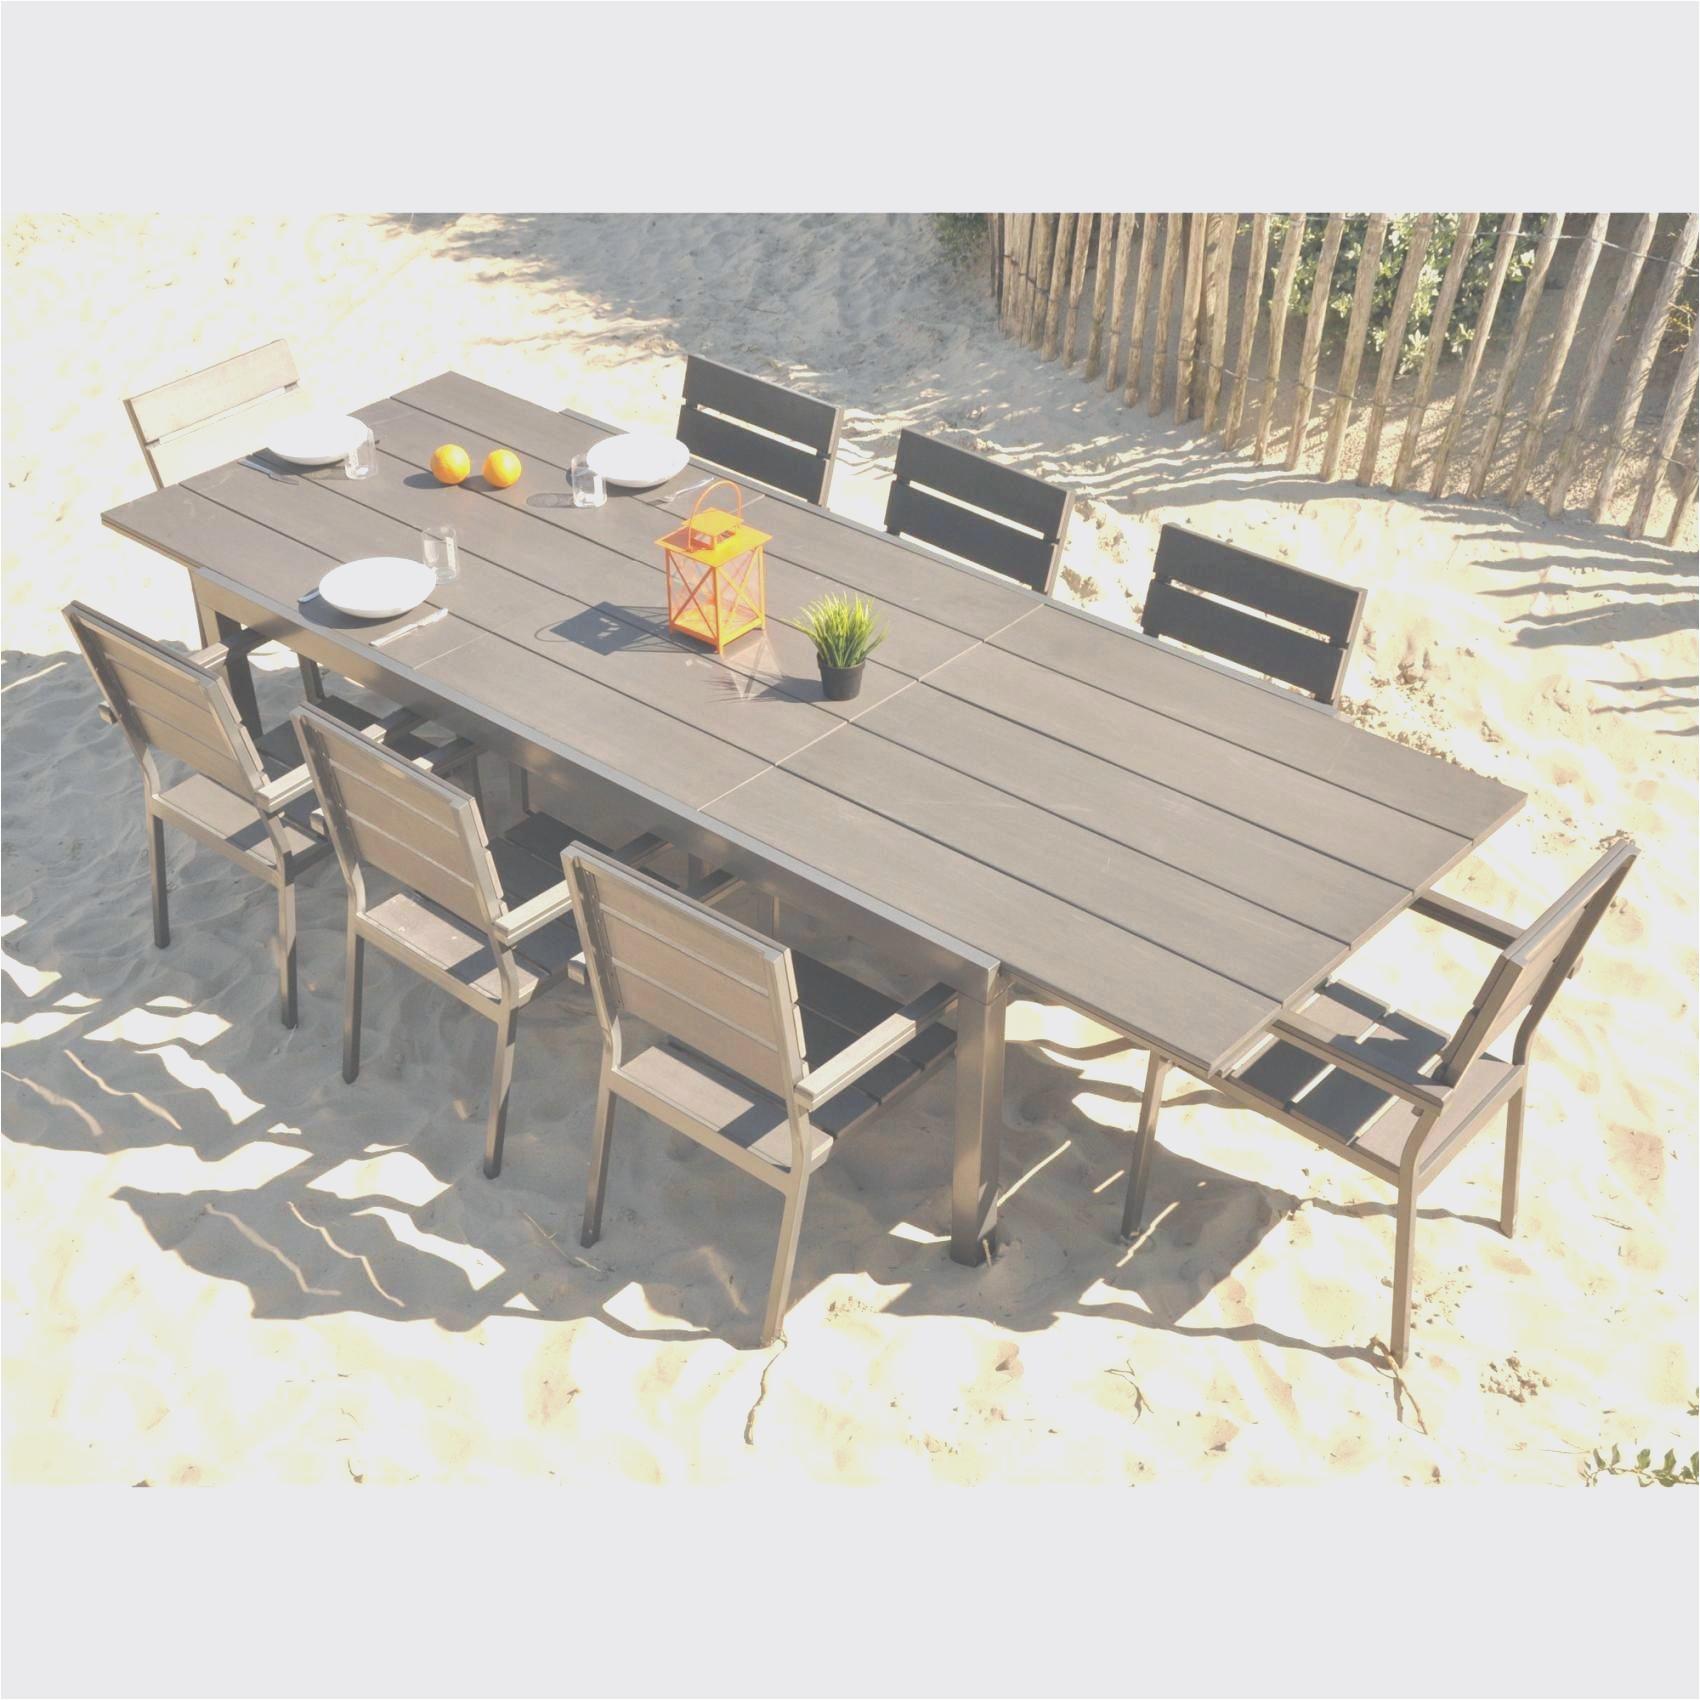 Petite Table Pliante Gifi Unique Stock Petite Table De Jardin Pliante Beau Petite Table Jardin Trad Hus